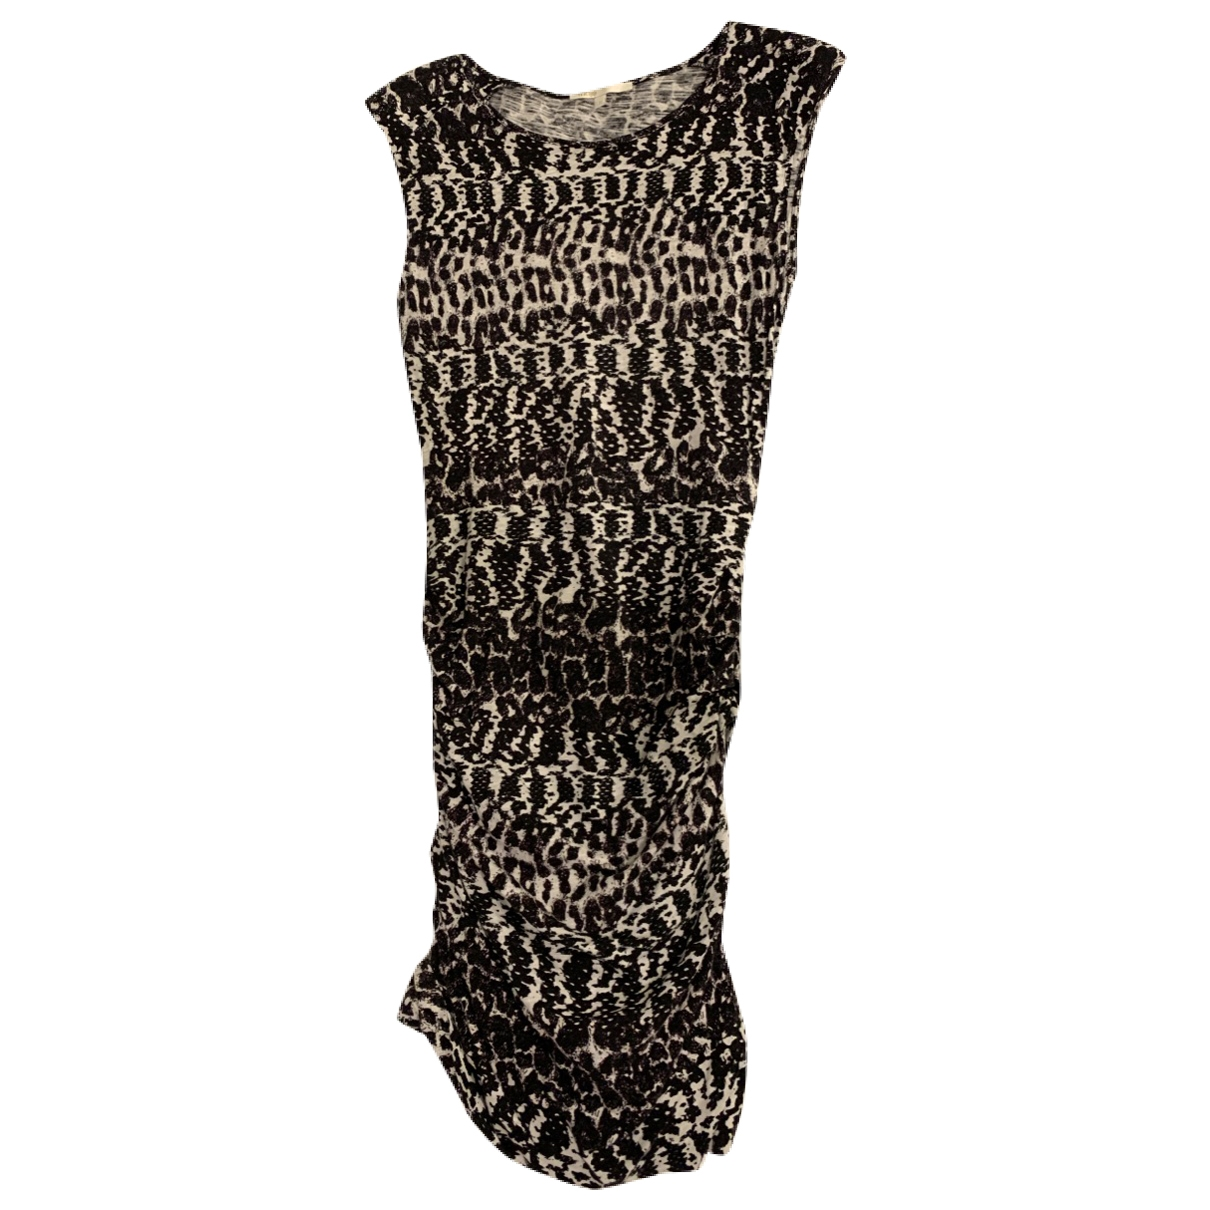 Maje \N Multicolour Cotton dress for Women 2 0-5